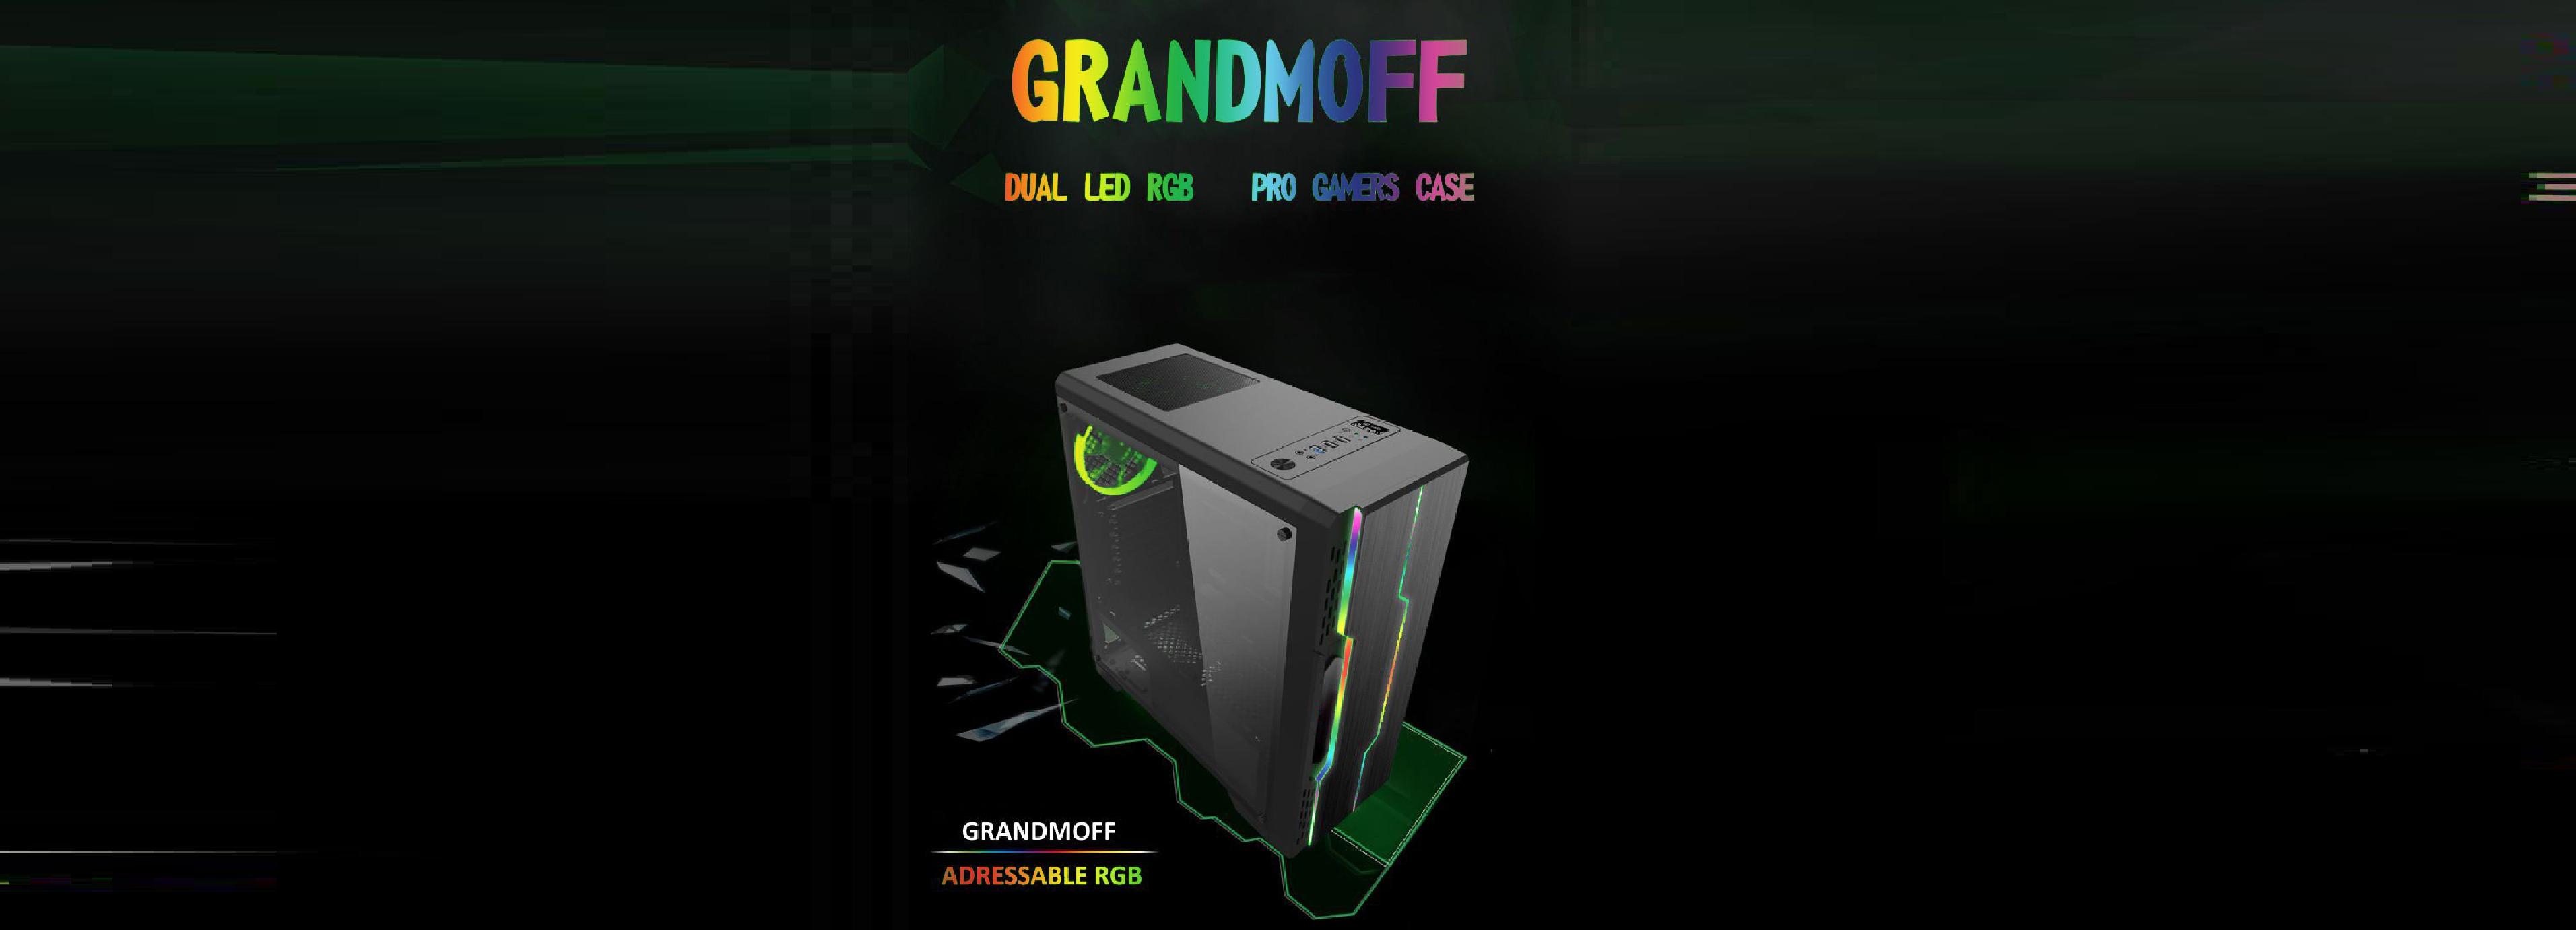 grandmoff1 p